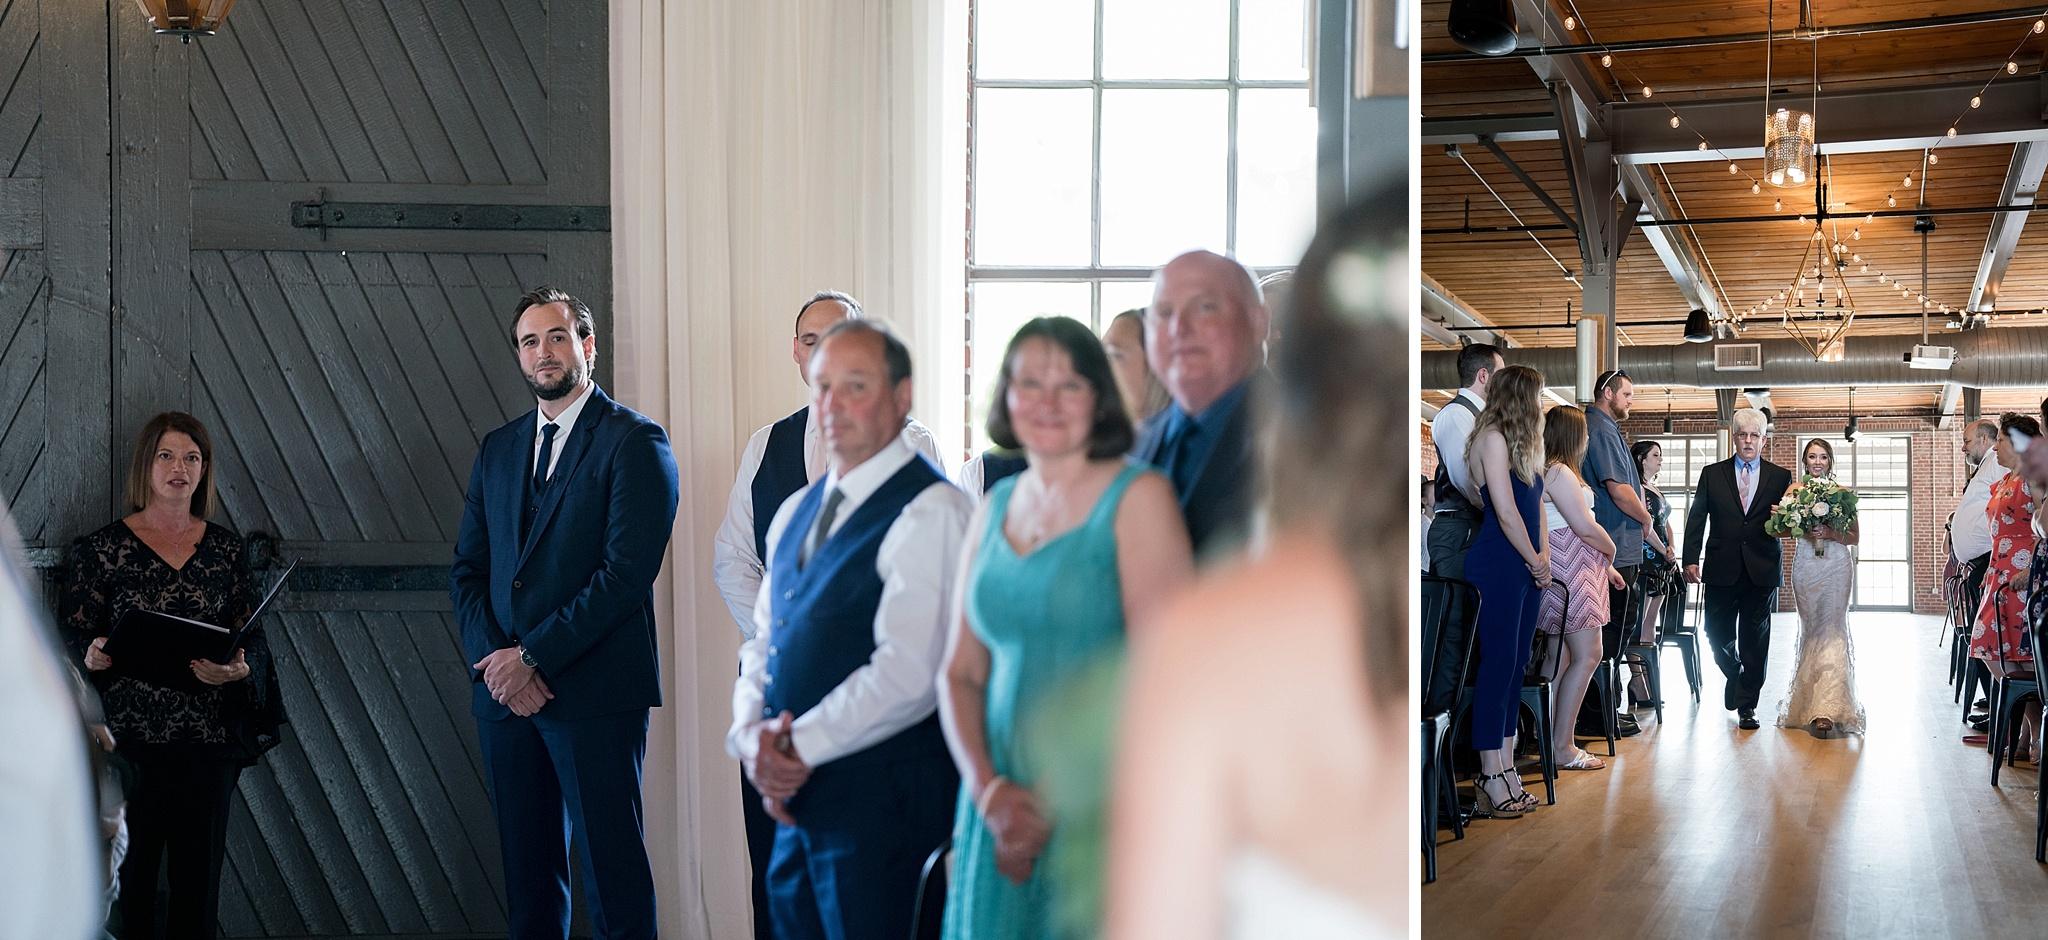 Rickhouse-Durham-NC-Wedding-Photographer-043.jpg